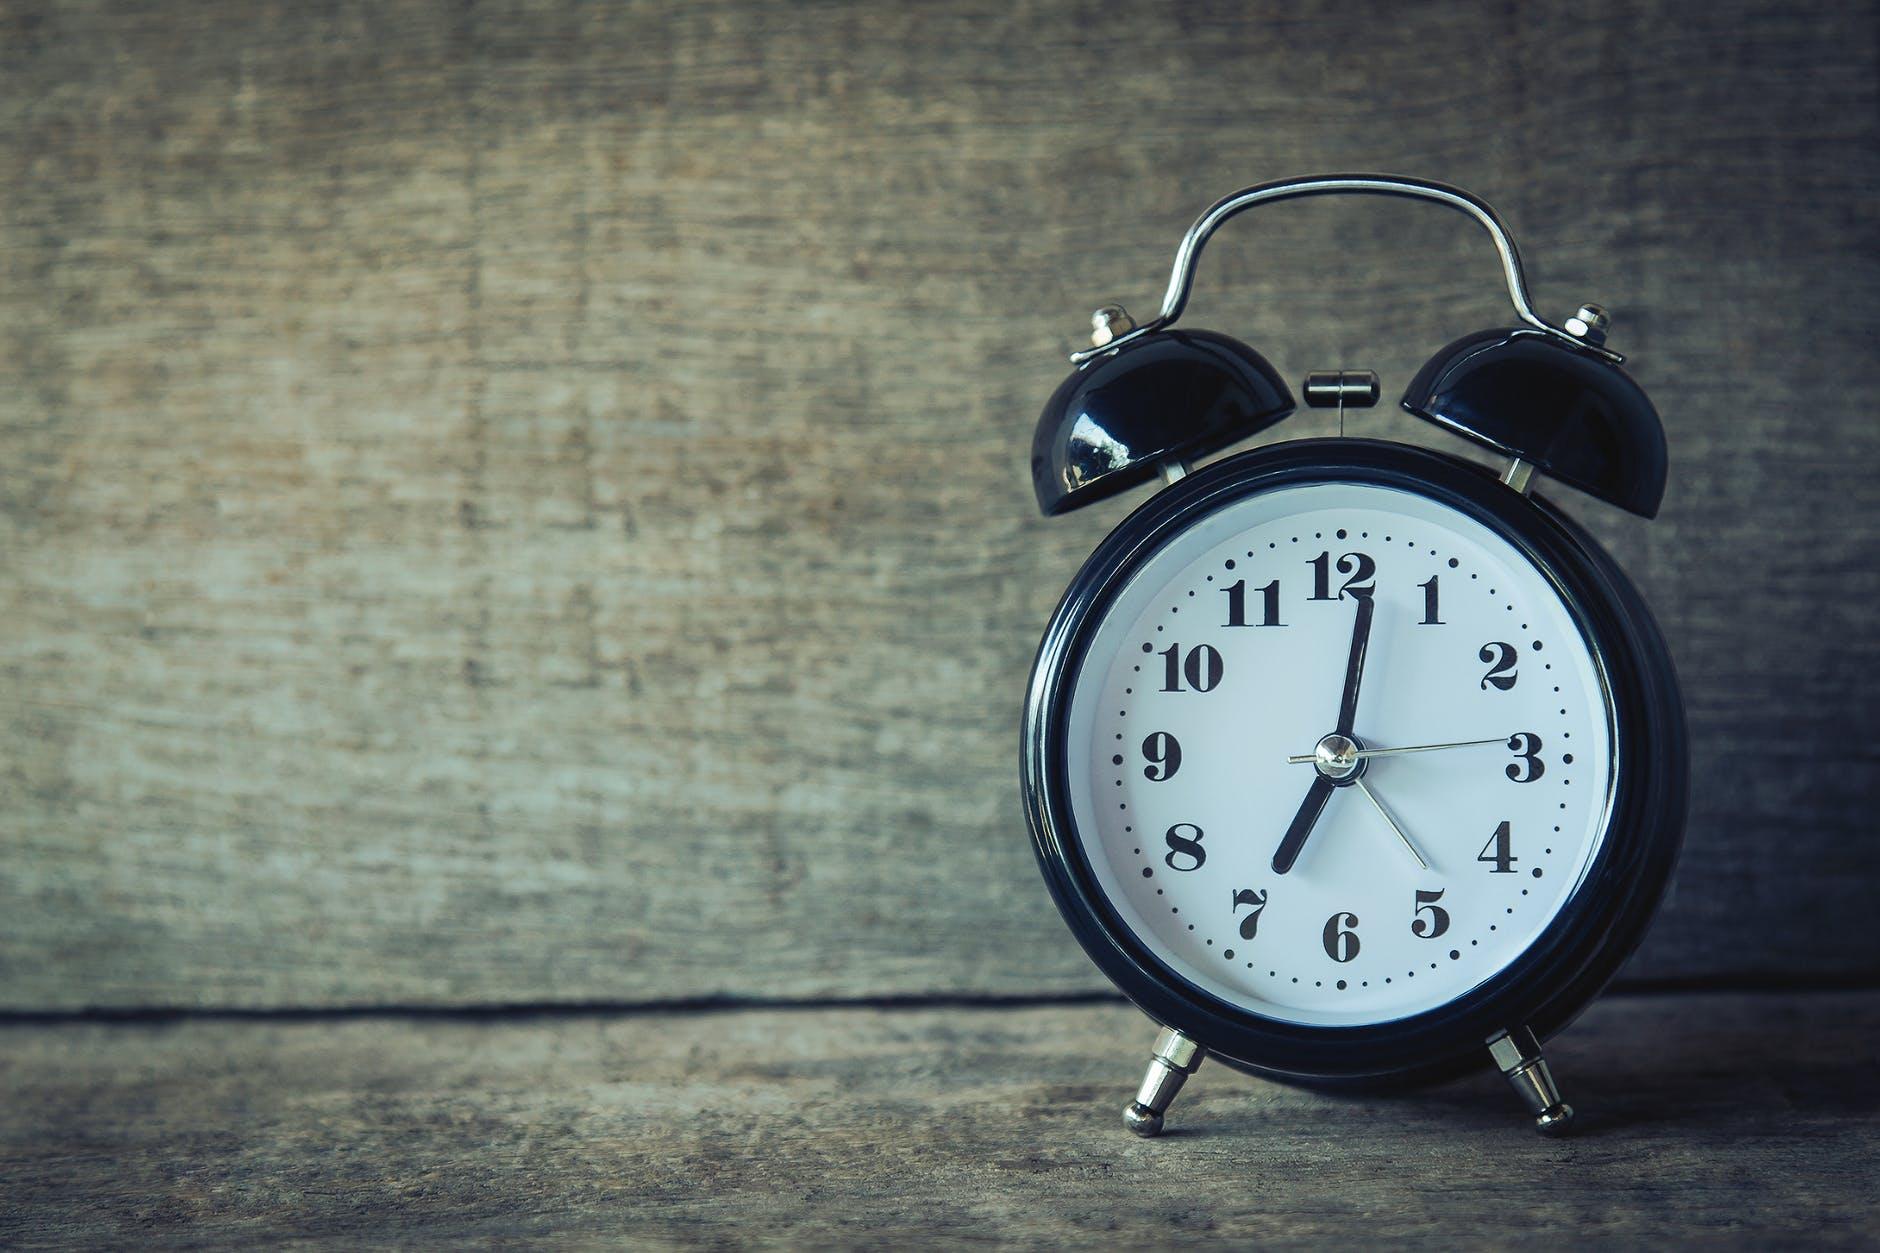 5 Bible Memory Time Hacks